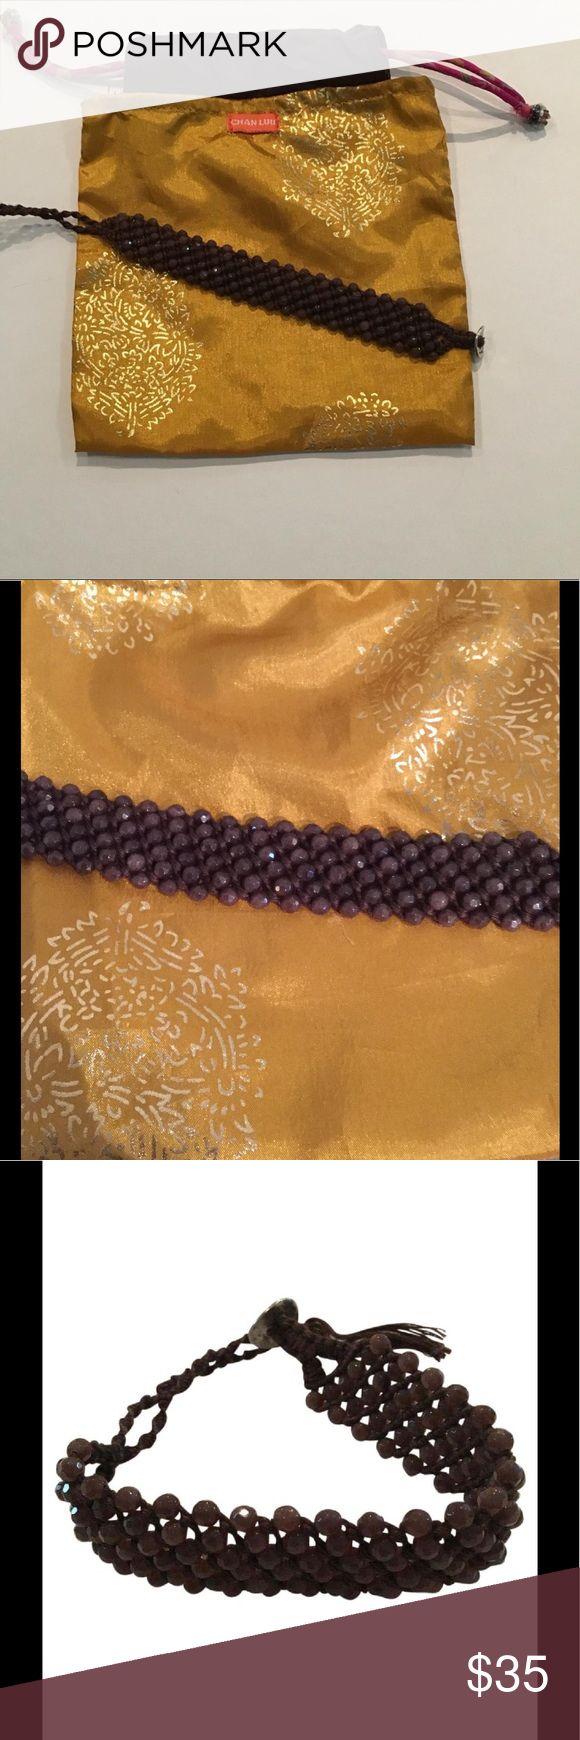 "Chan Luu brown beaded wrap bracelet. LIKE NEW. Chan Luu brown beaded bracelet. No signs of wear. Comes in original silk Chan Luu bag. Beaded part of bracelet is: 7"", max length 10"", minimum length 8"". Beads and string are both brown. Chan Luu Jewelry Bracelets"